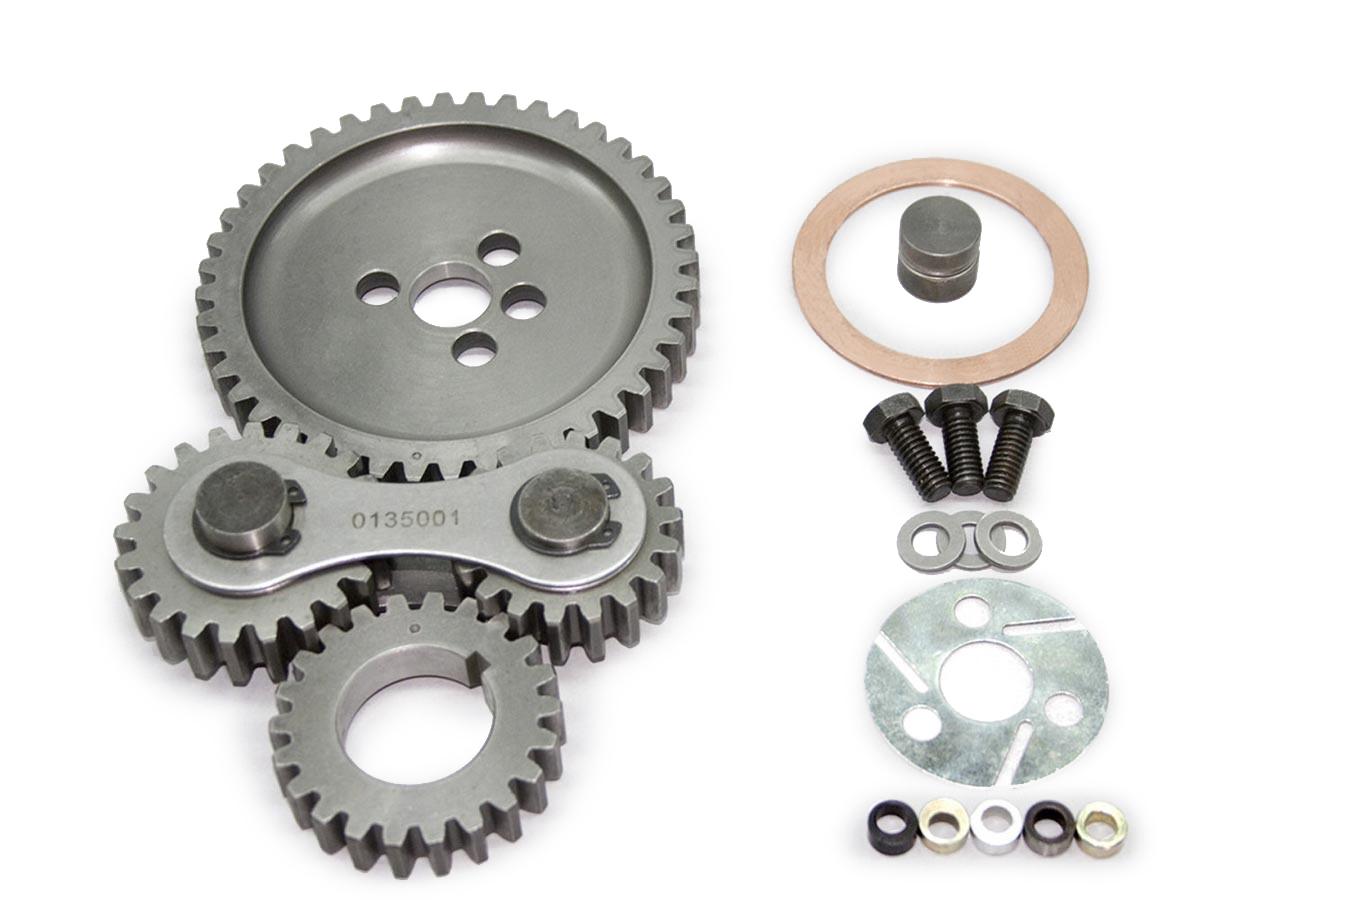 PRW Industries 0135001 Timing Gear Drive, Dual Gear, Dual Idler, Noisy, Steel, Small Block Chevy, Kit